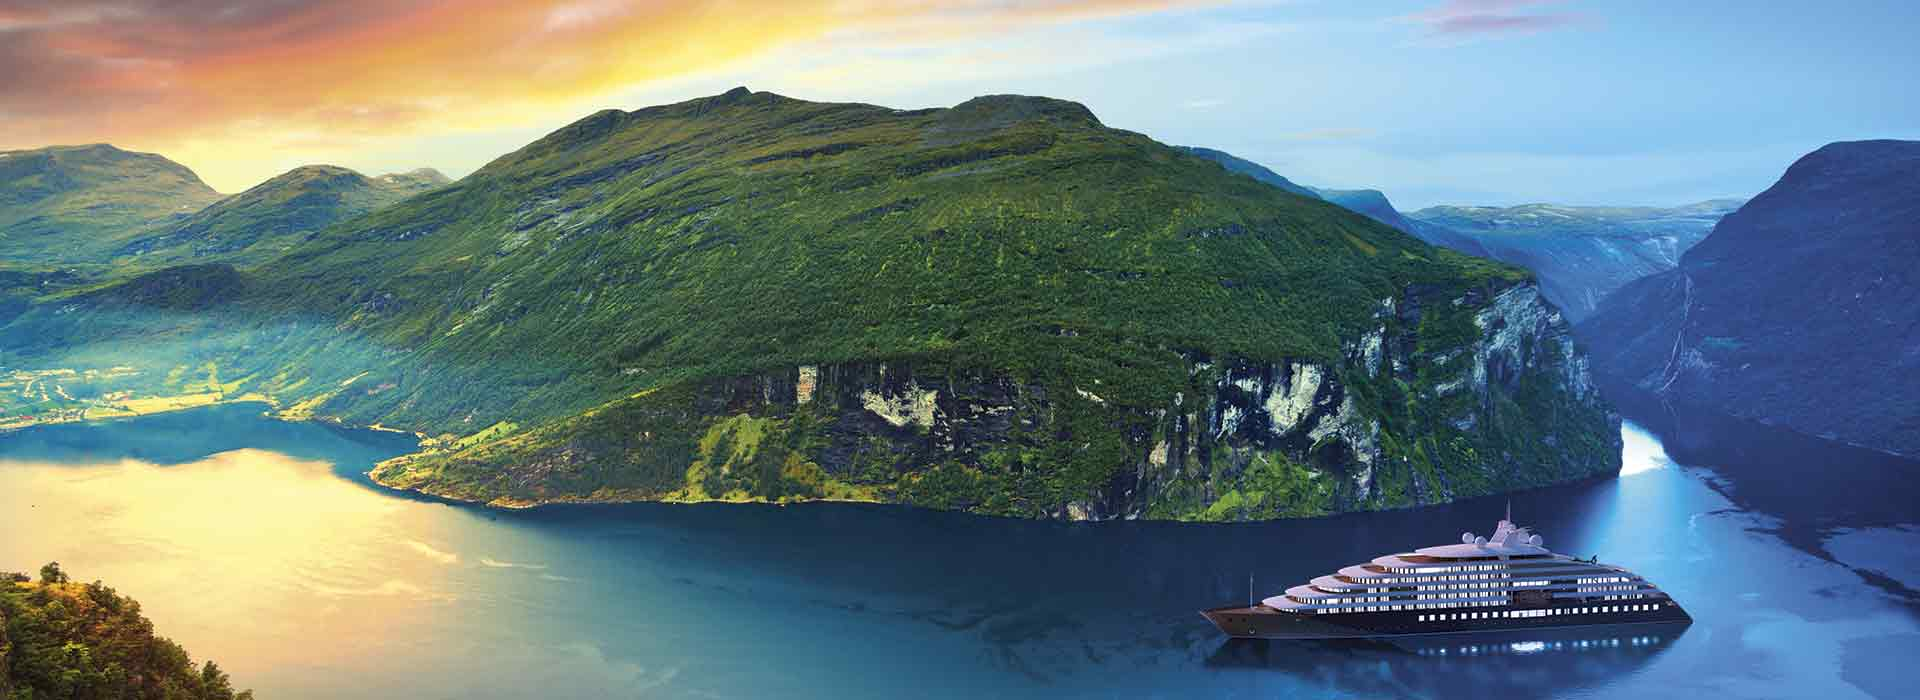 Scenic Eclipse im Fjord